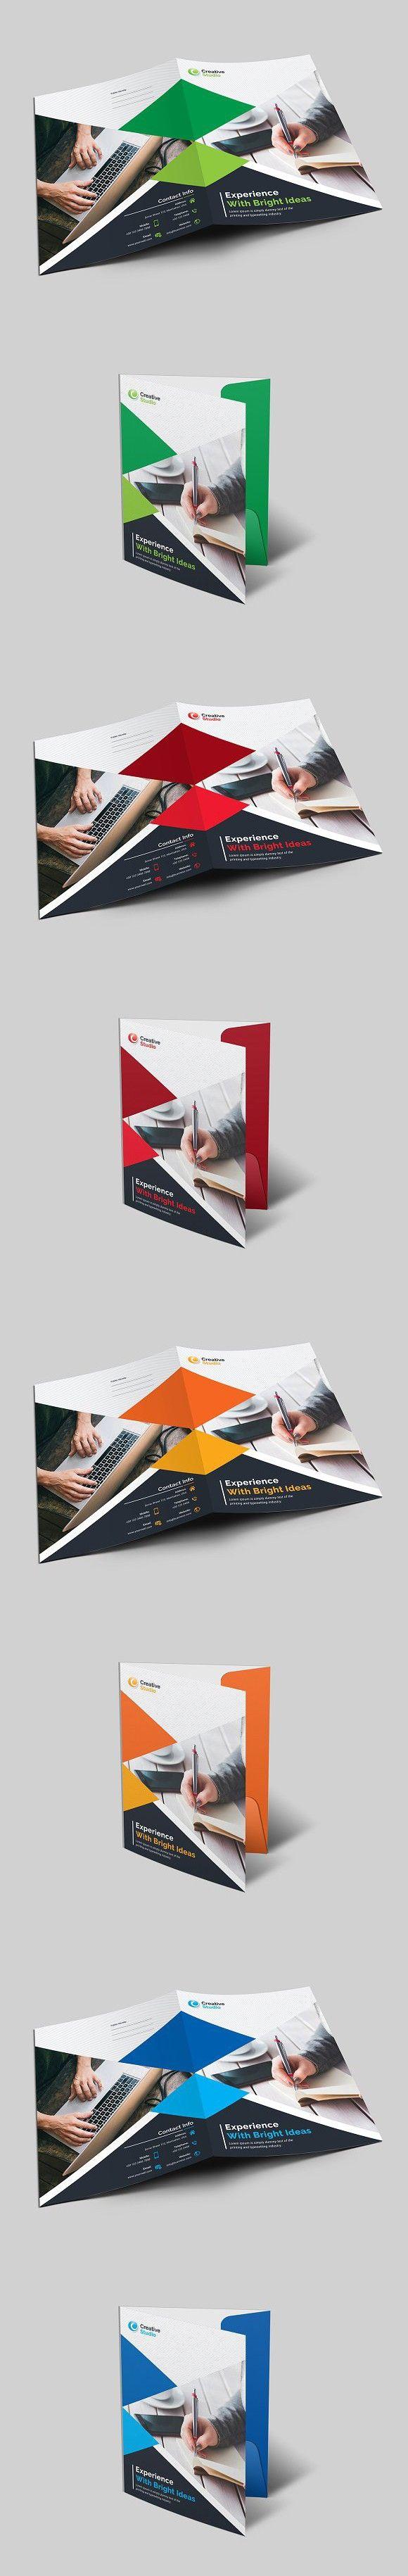 Corporate Presentation Folder. Stationery Templates